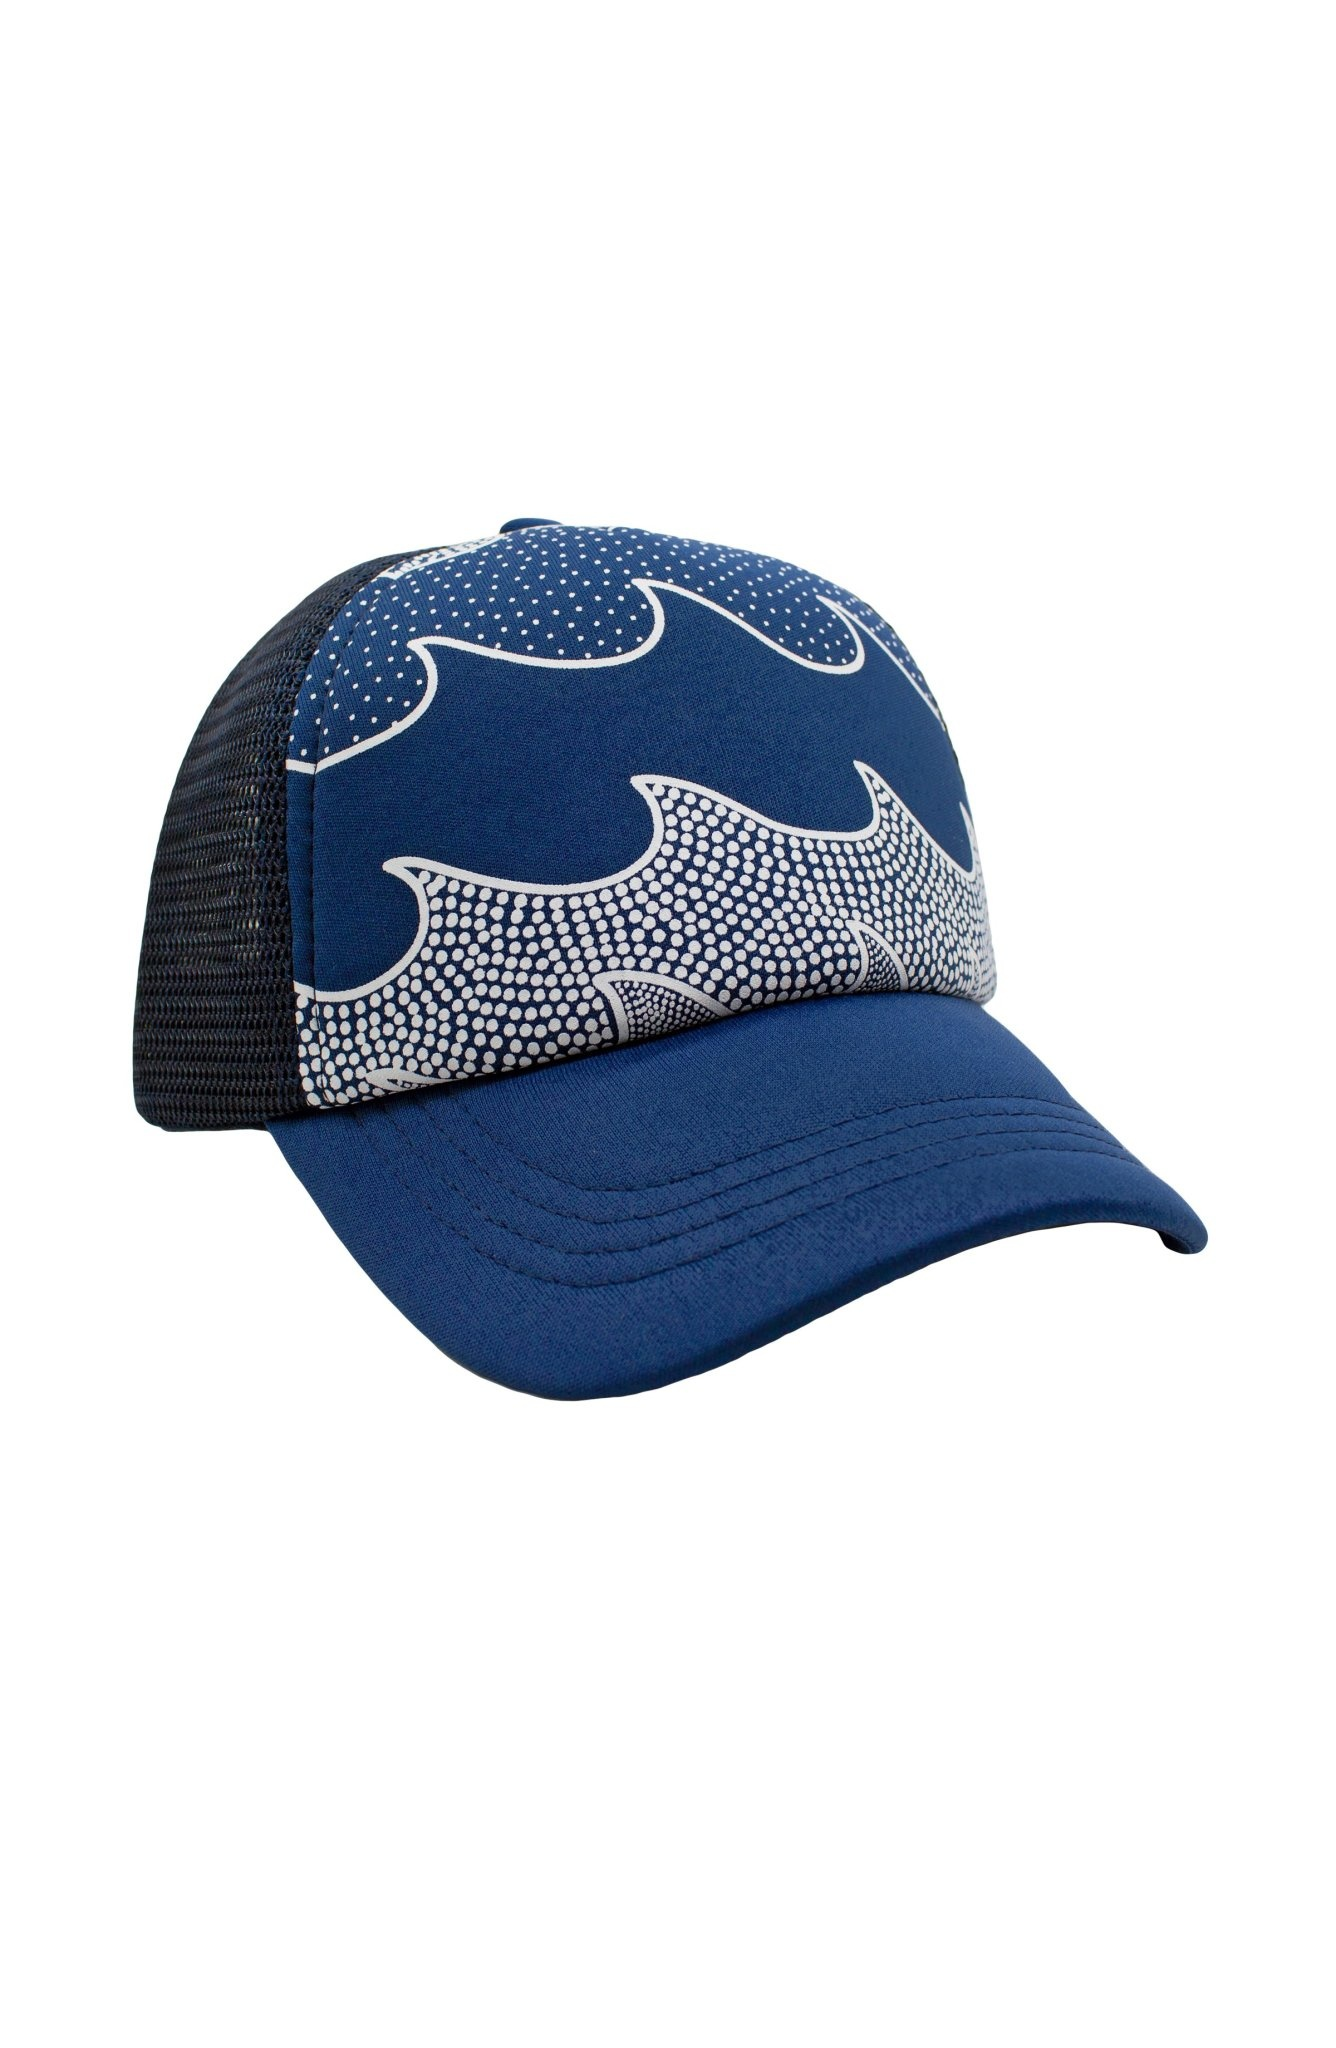 Feather 4 Arrow Cosmic Waves Hat